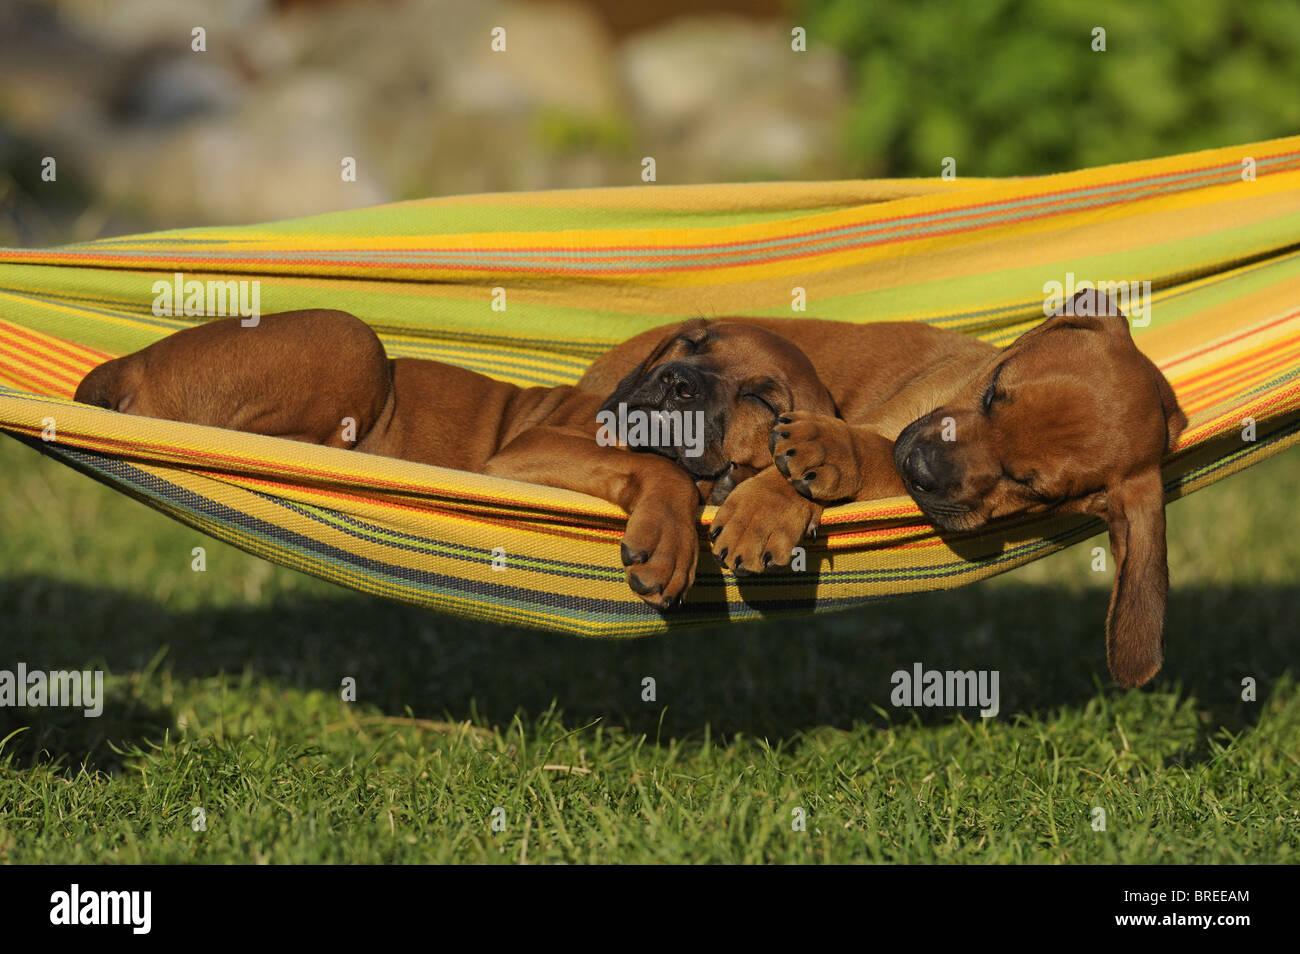 Rhodesian Ridgeback (Canis lupus familiaris). Two puppies sleeping in a hammock. - Stock Image